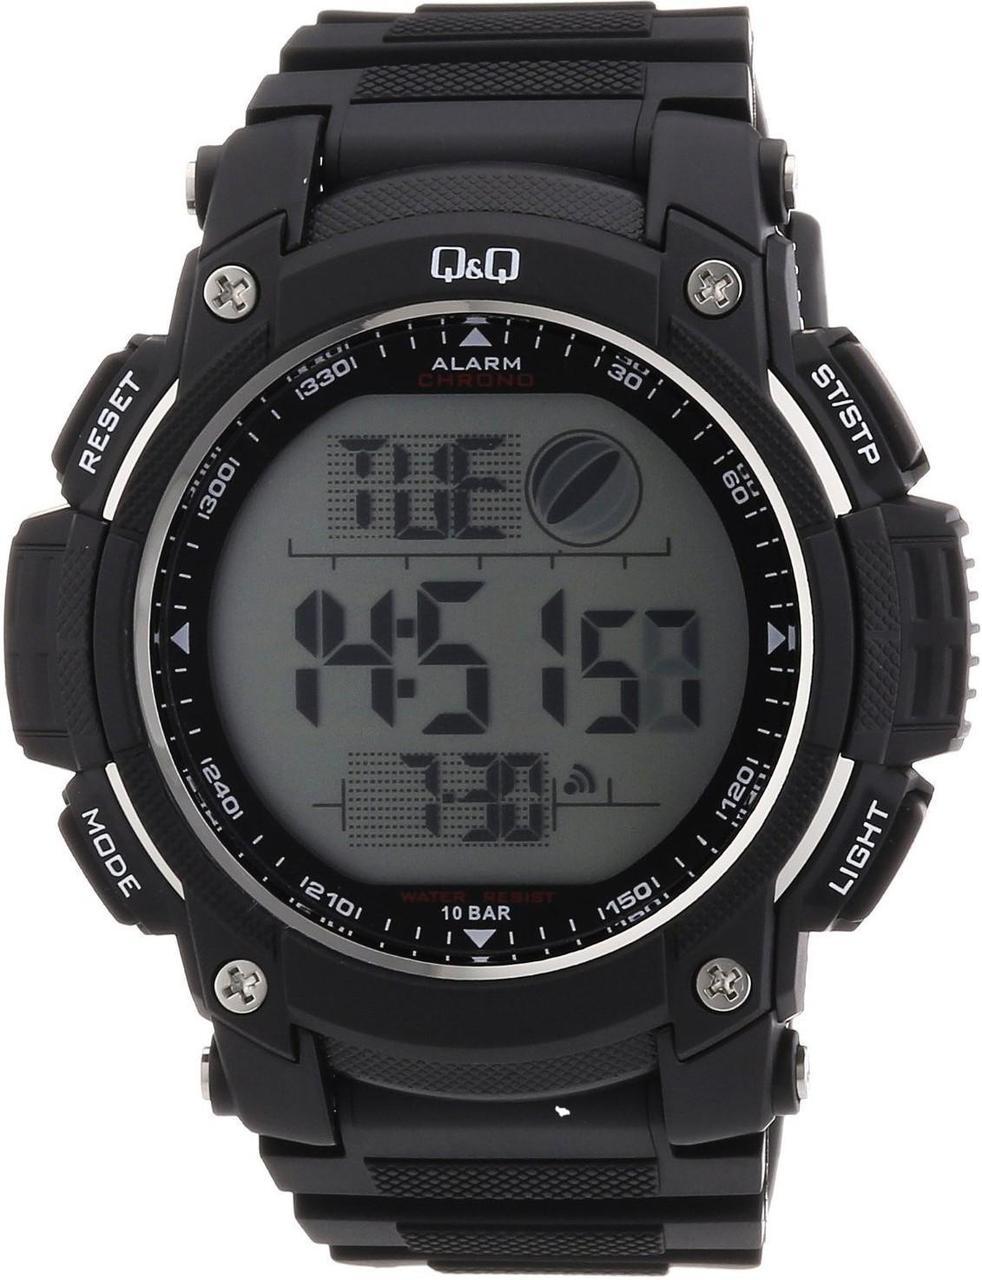 Наручные мужские часы Q&Q M119J001Y оригинал